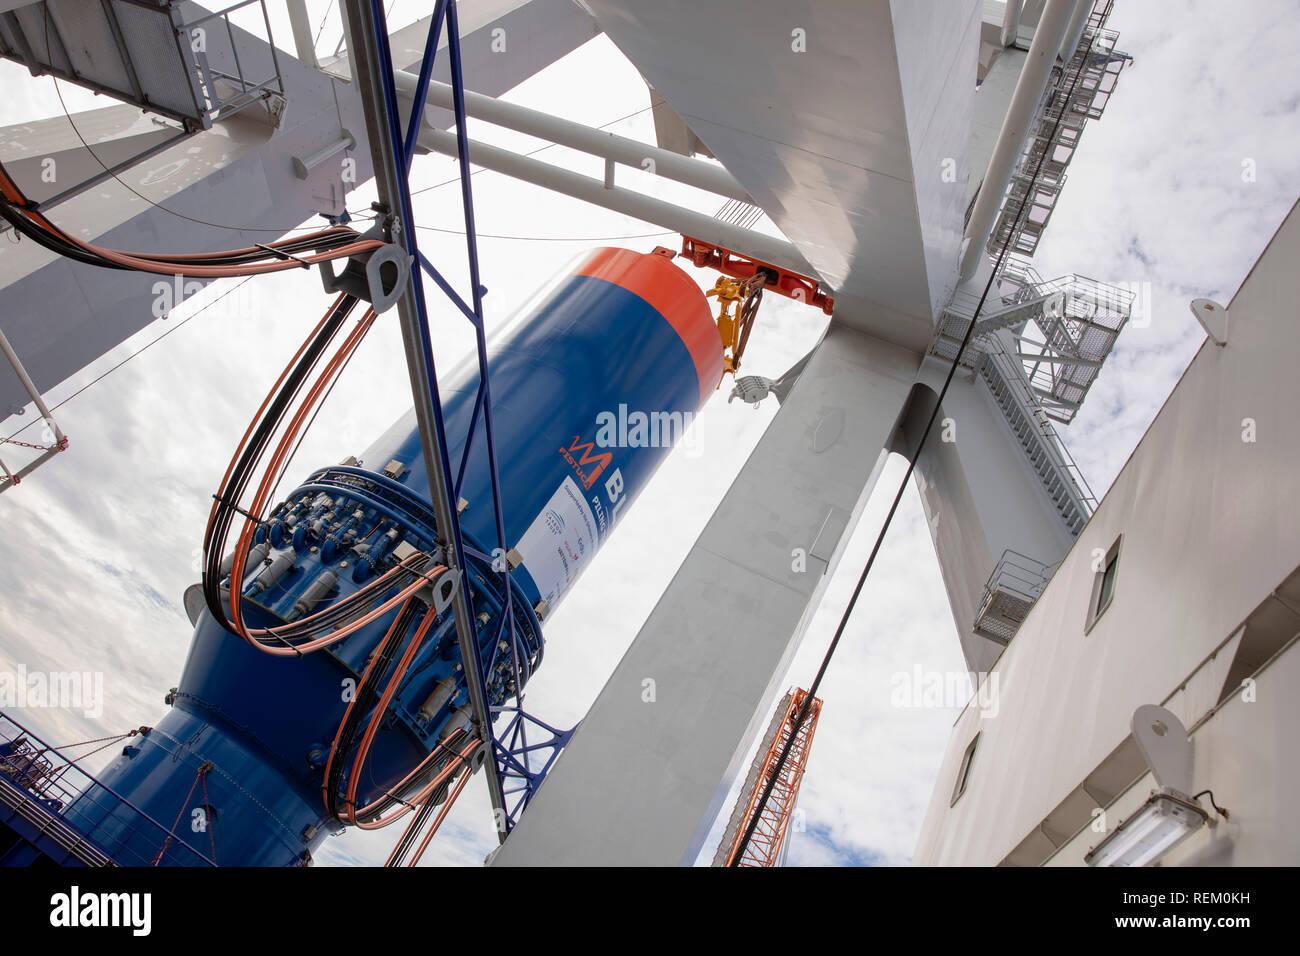 The Netherlands, Rotterdam, Port of Rotterdam, harbour. Van Oord international marine contractor. Heavy lift vessel Svanen. - Stock Image